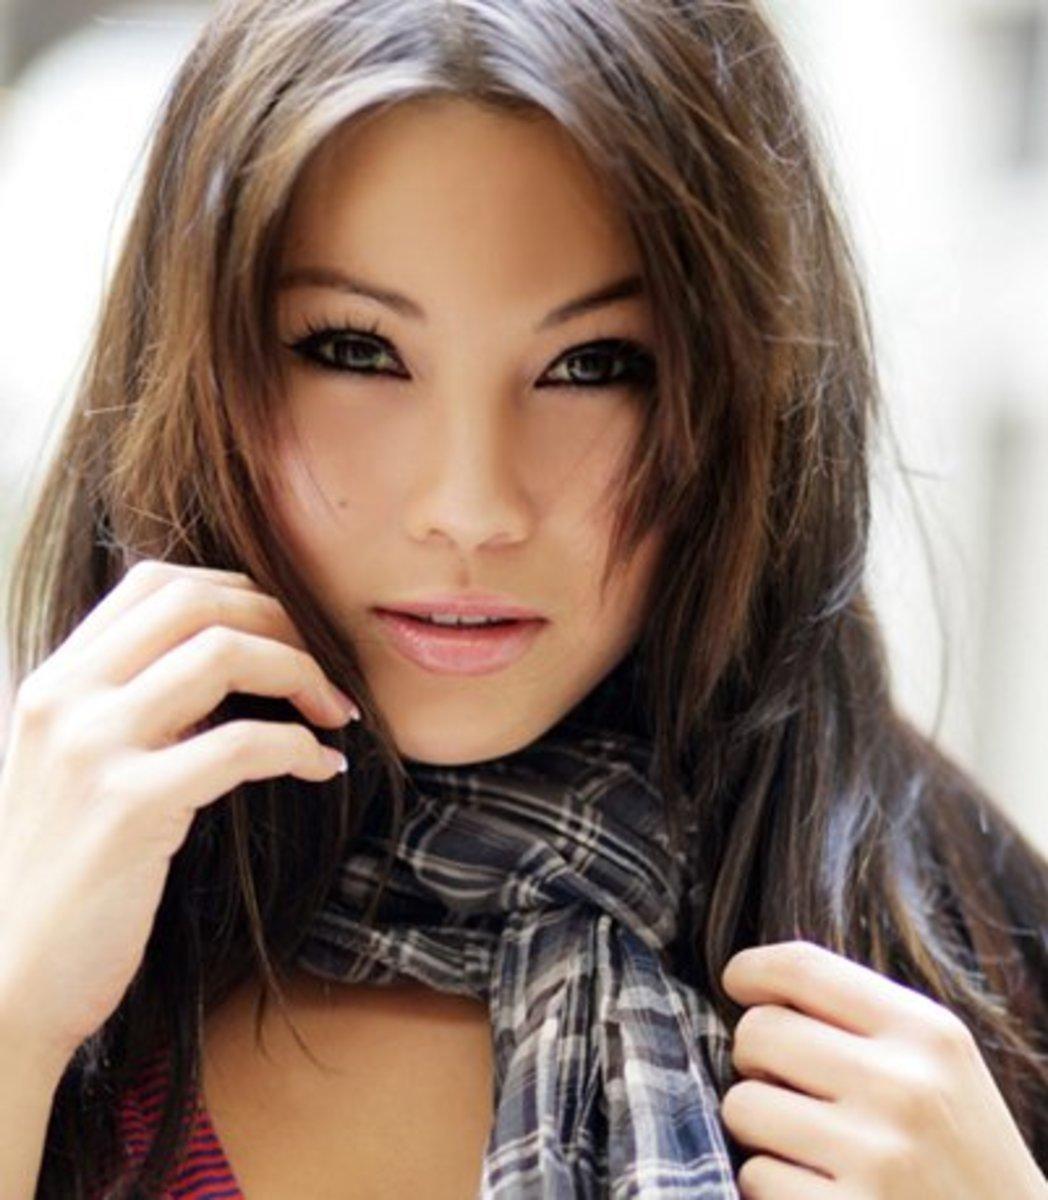 lisa-kim-fleming-hot-import-model